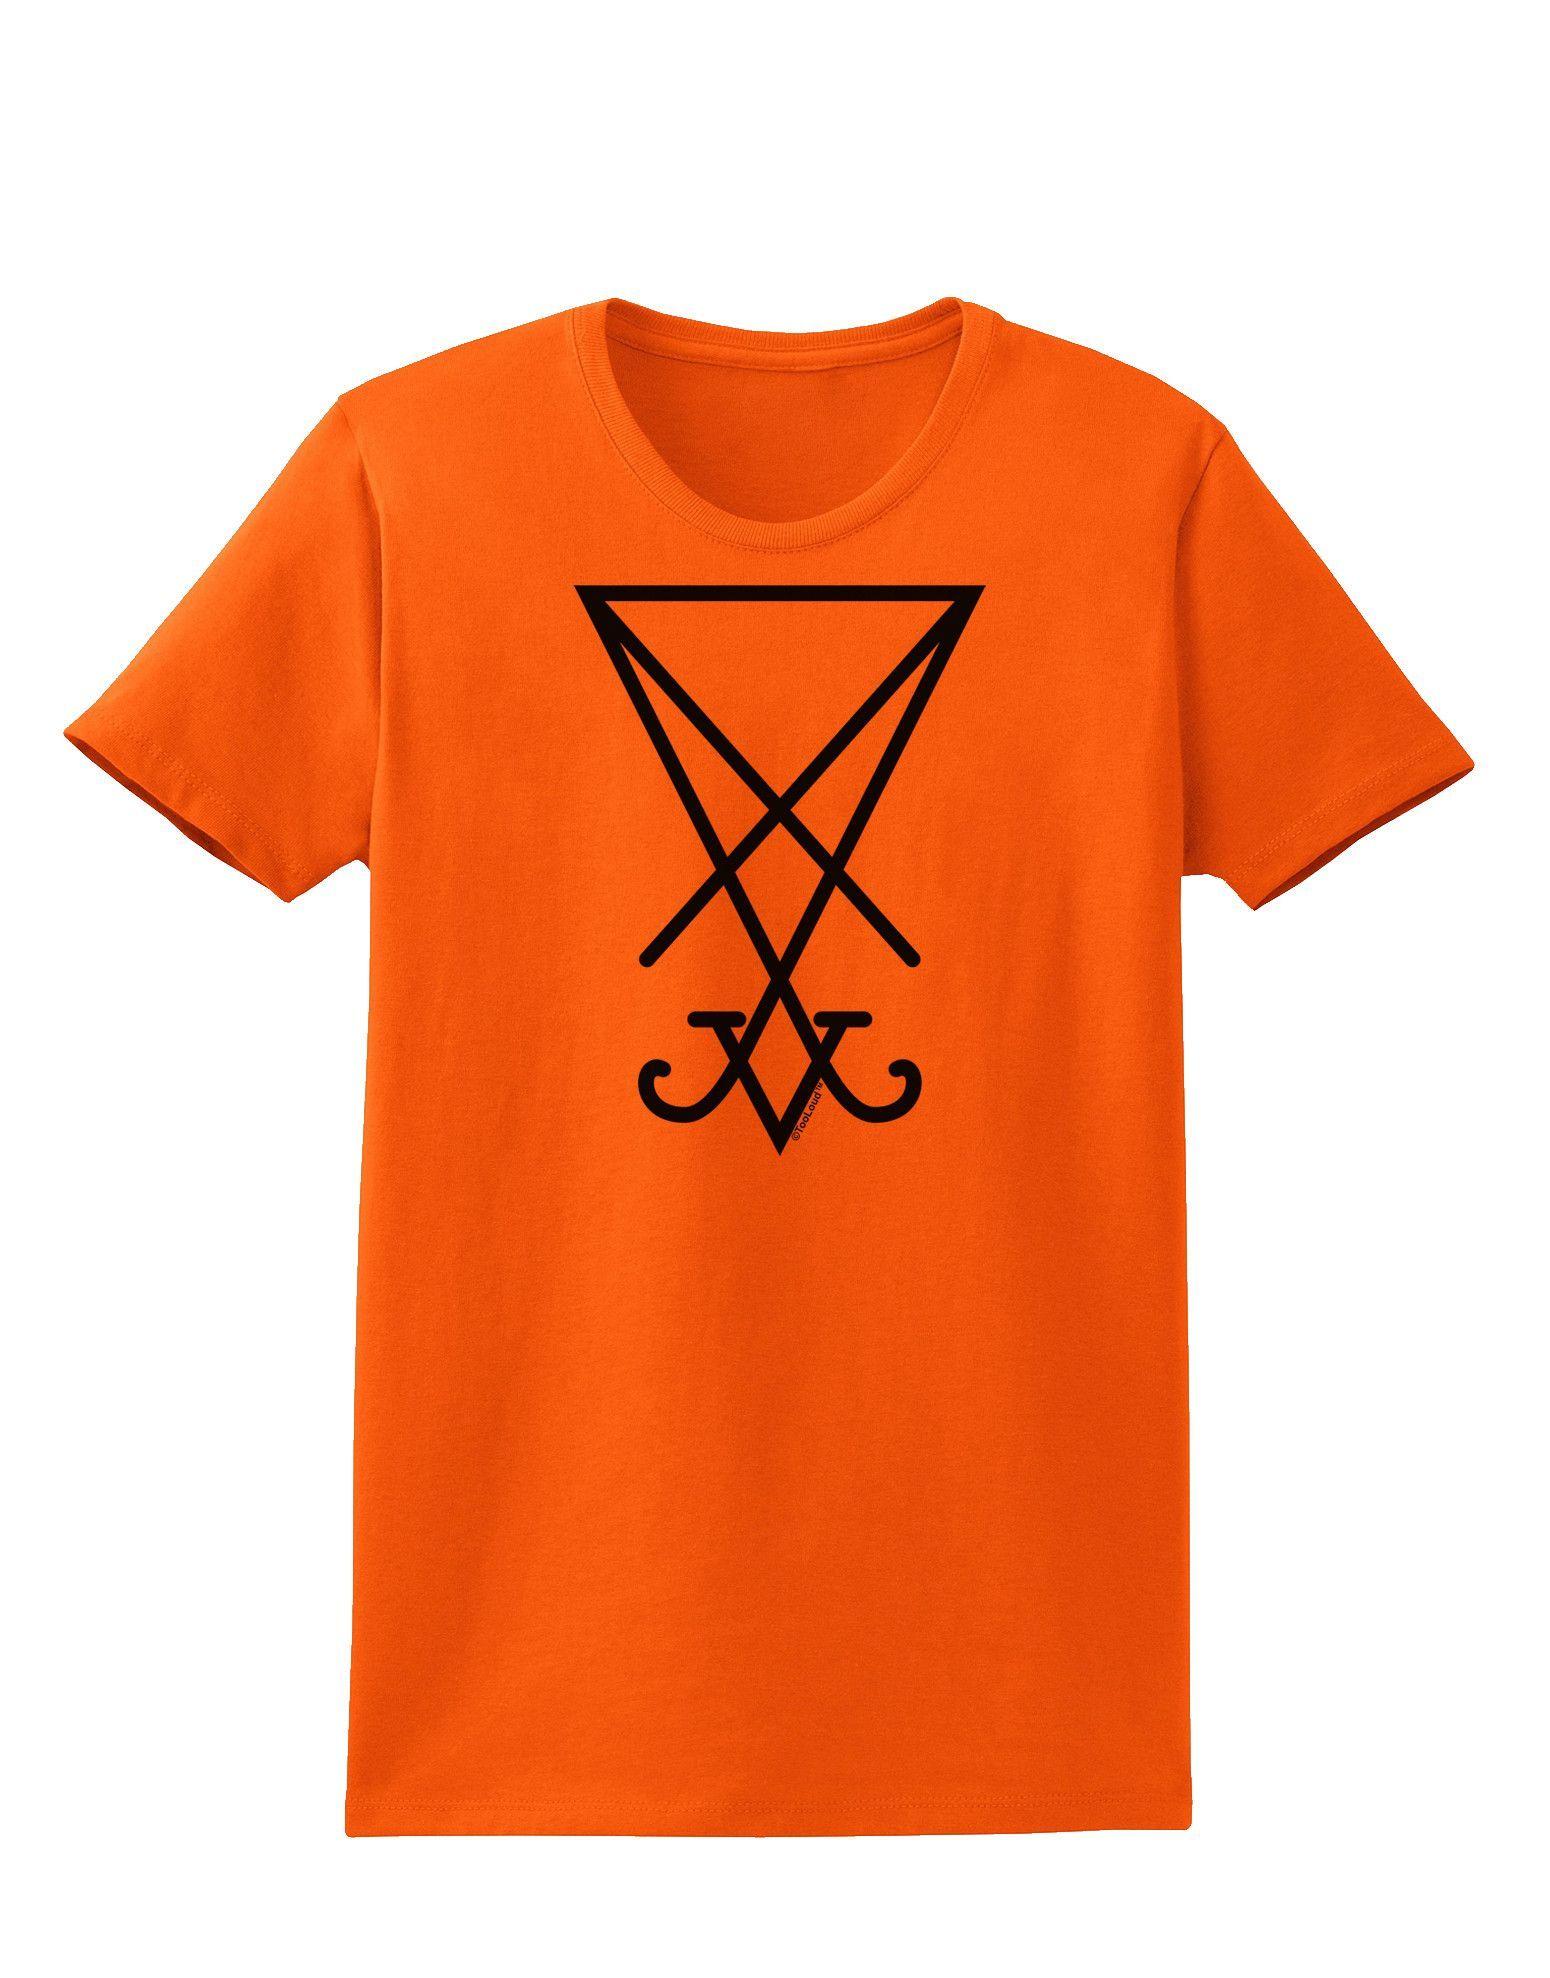 TooLoud Sigil of Lucifer - Seal of Satan Womens T-Shirt